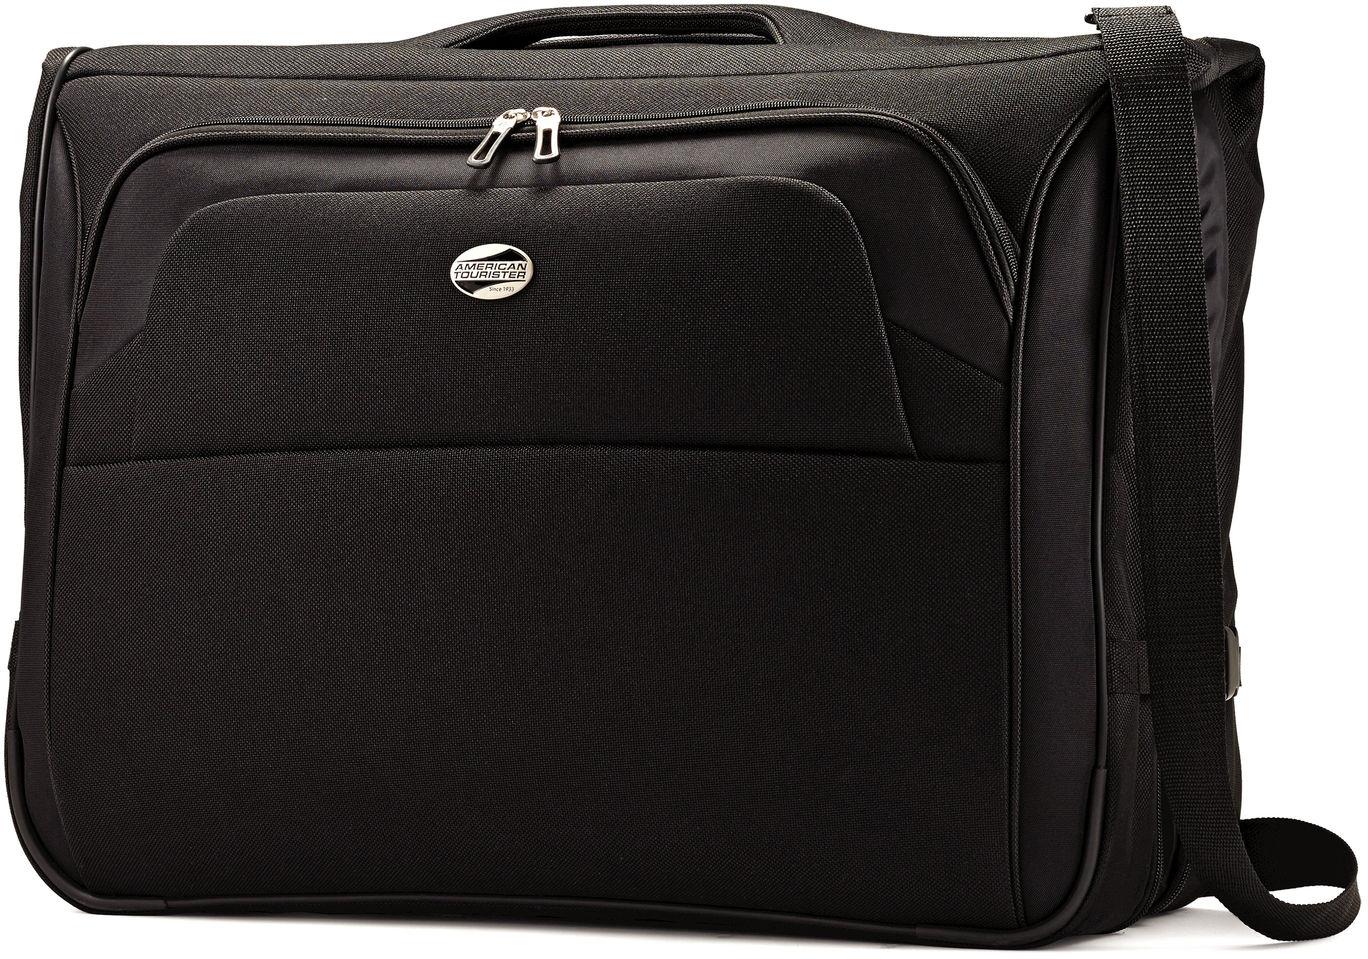 American Tourister iLite Xtreme UltraValet Garment Bag